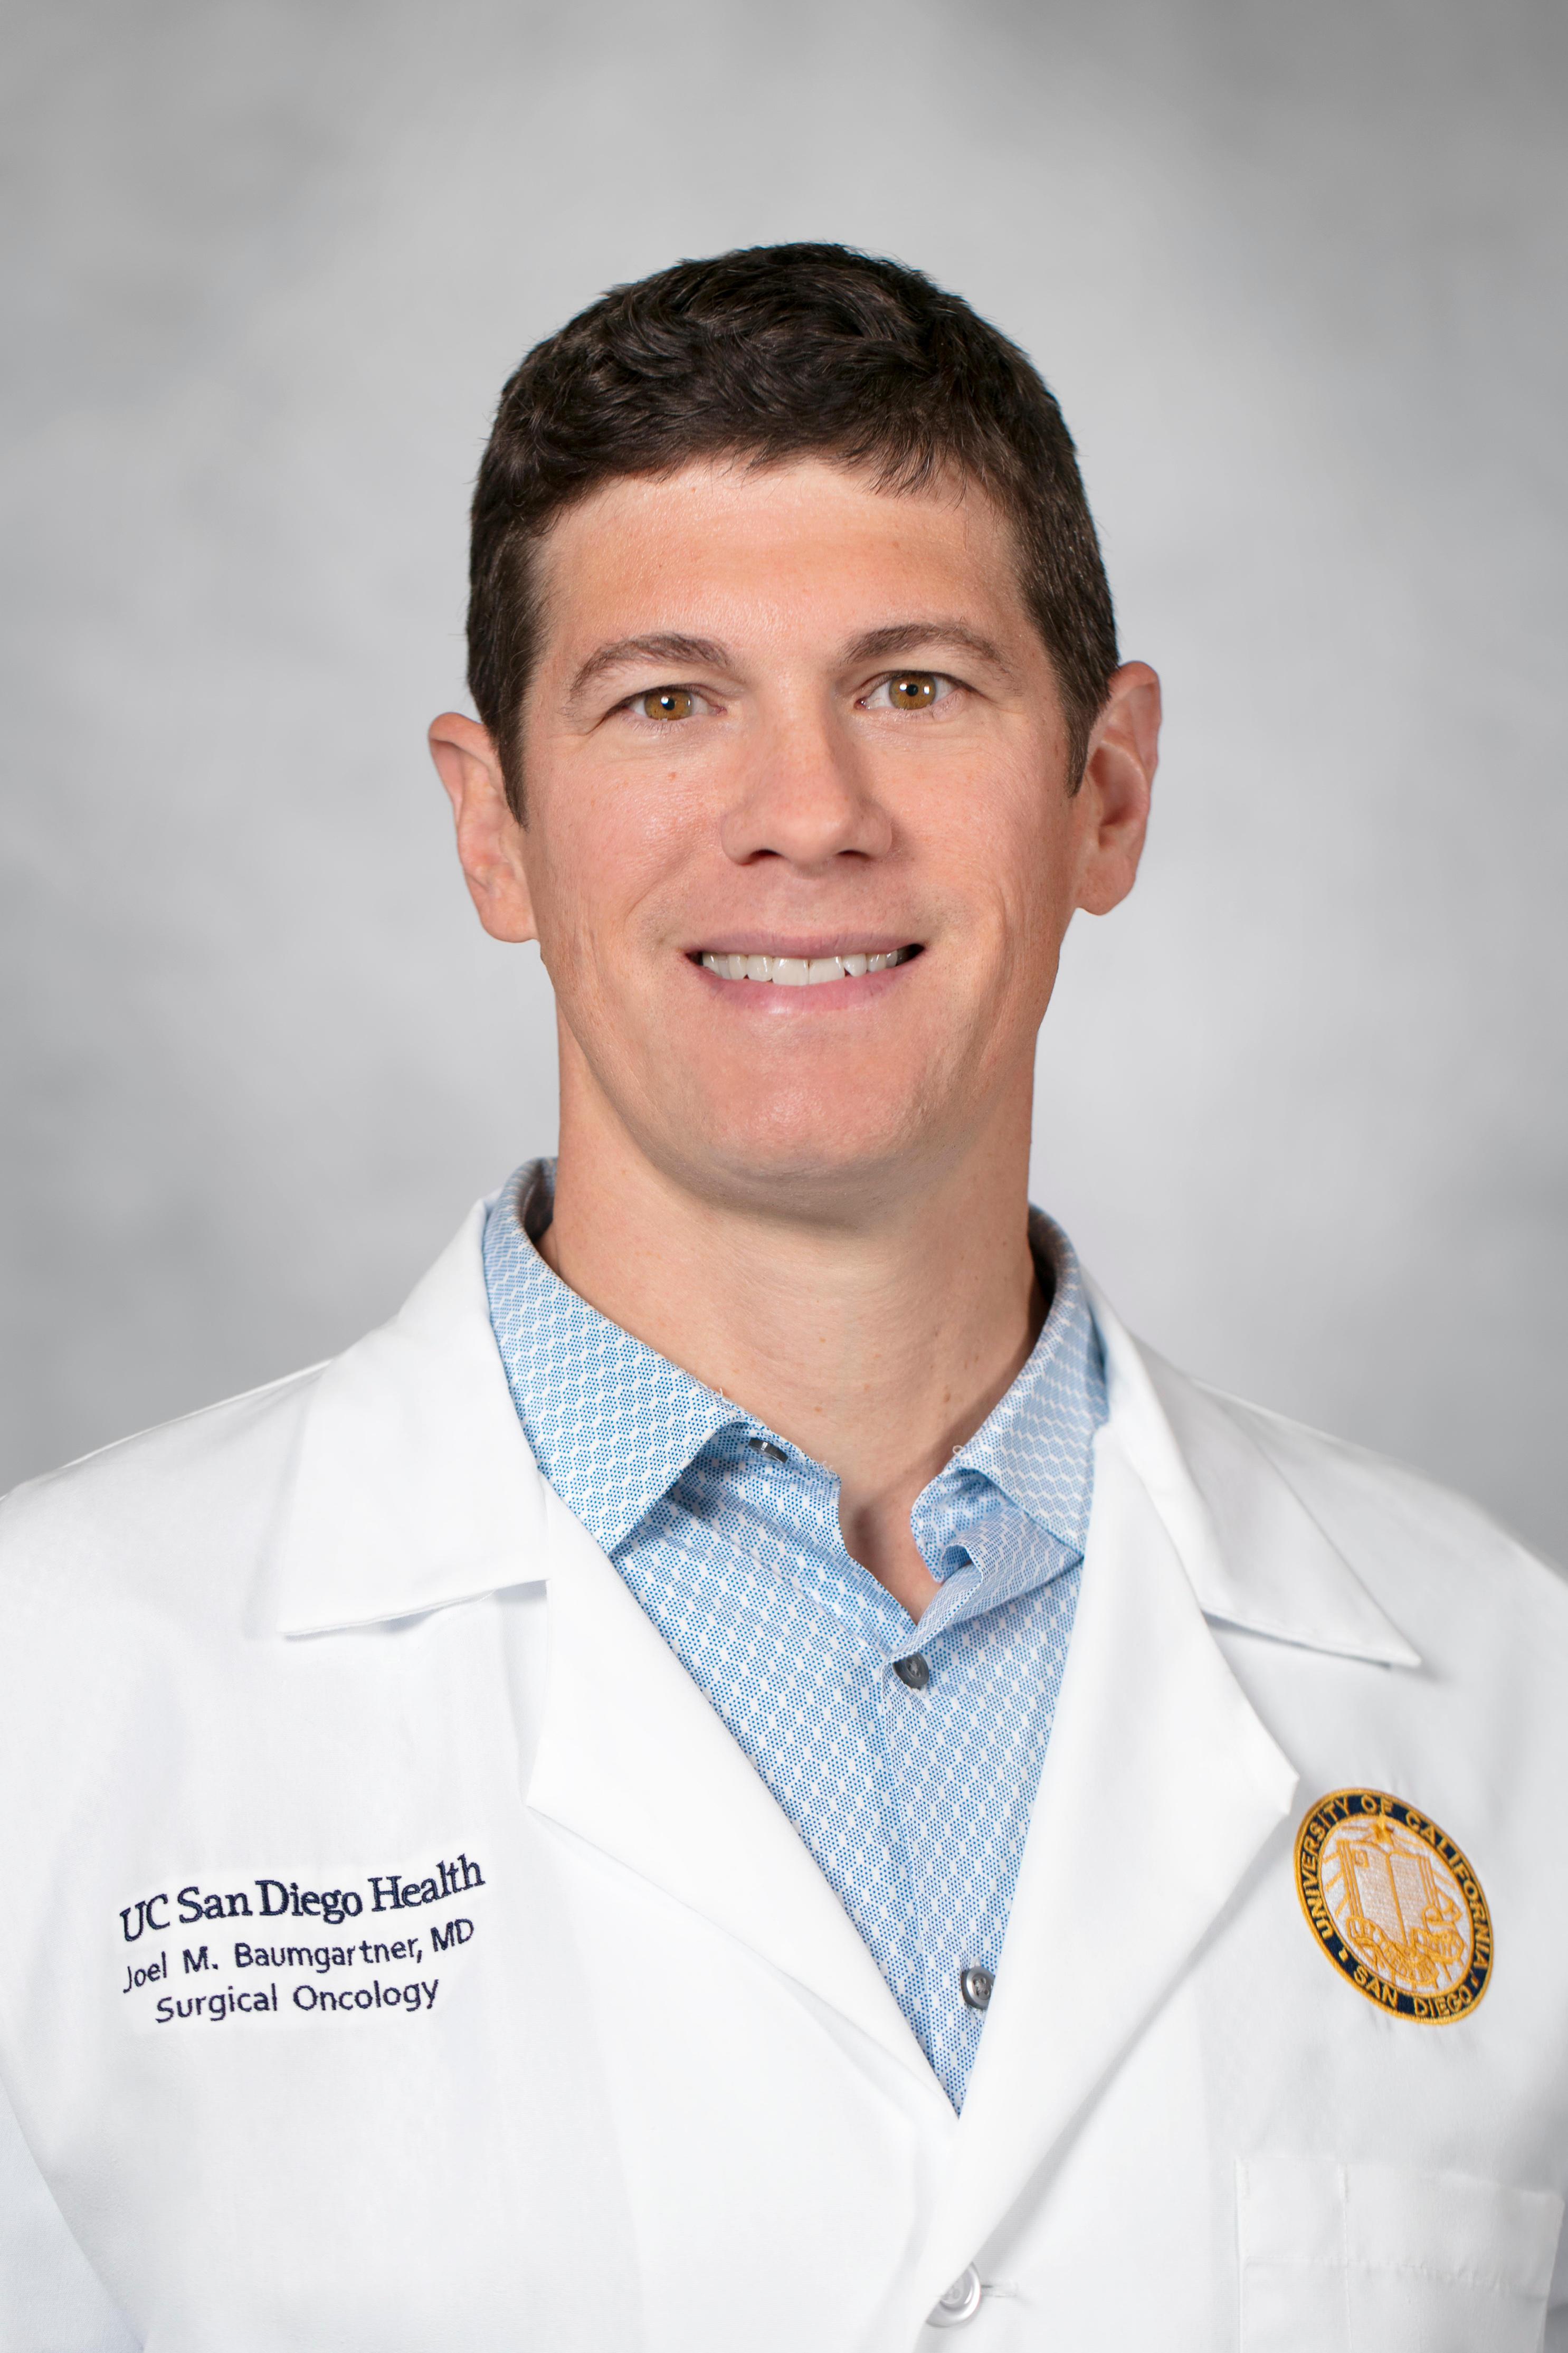 Joel M. Baumgartner, MD